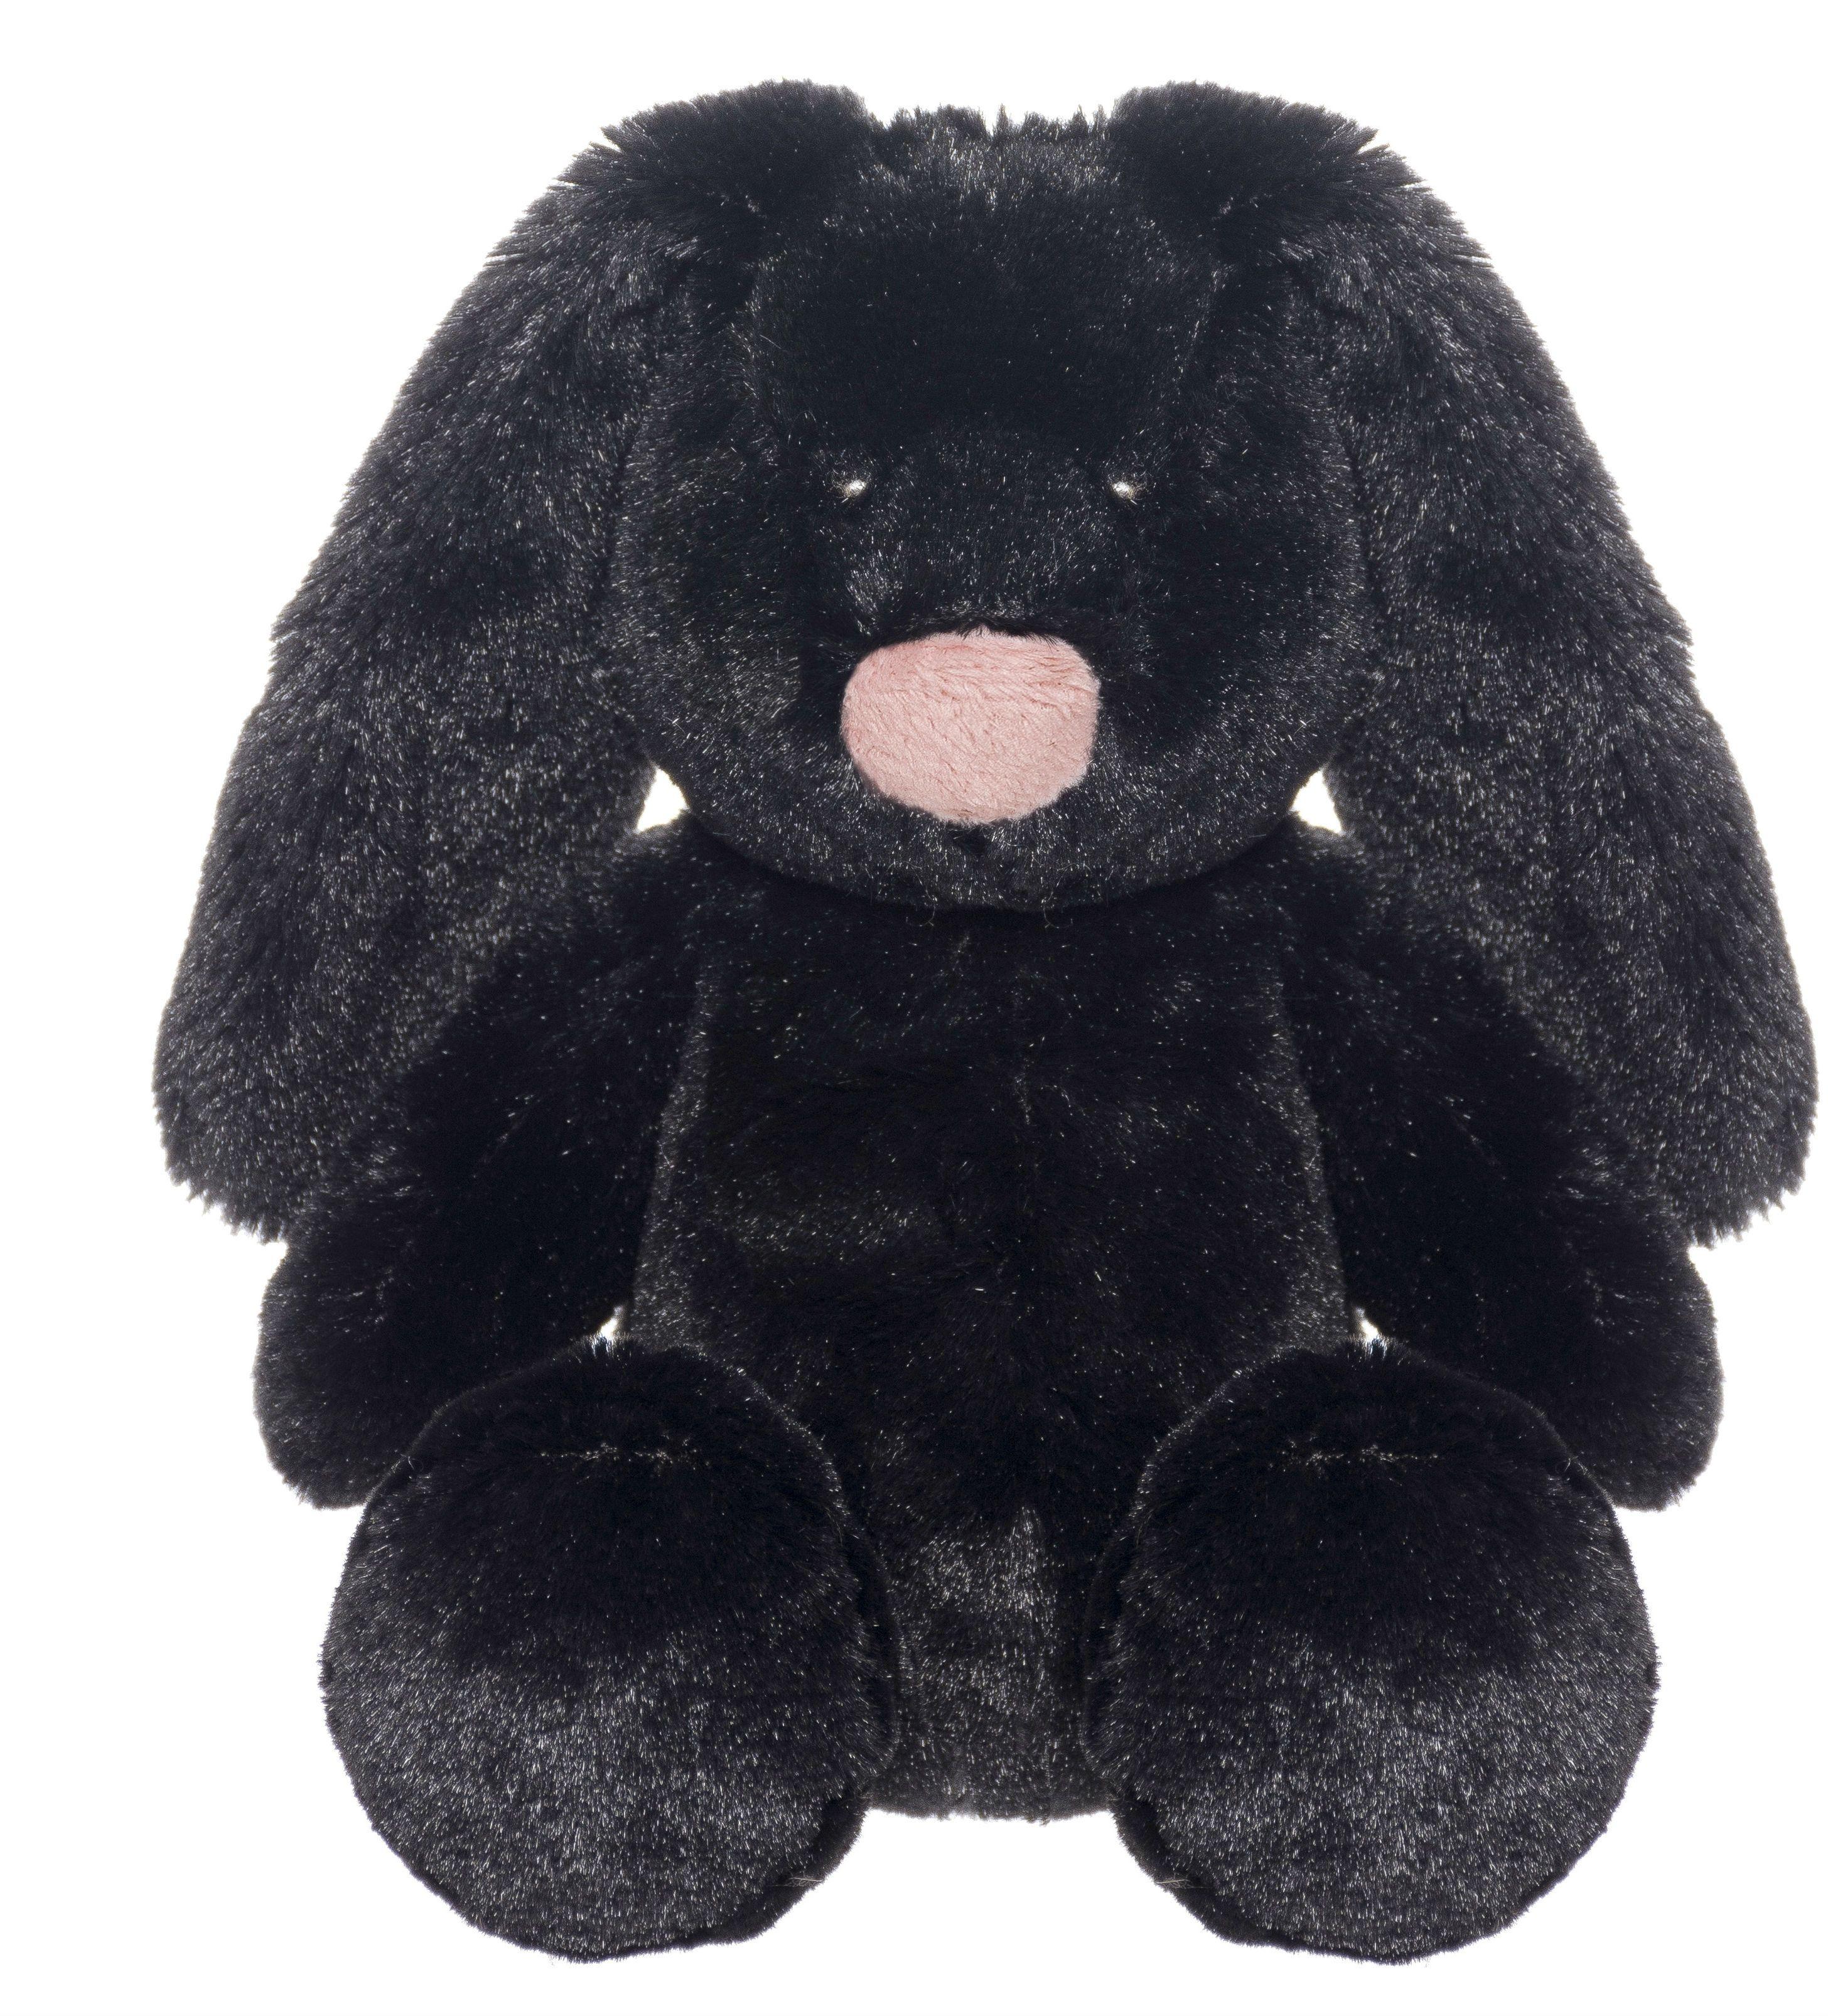 Image of Kanin fra Teddykompaniet - Jessie - Sort (29 cm) (2517)